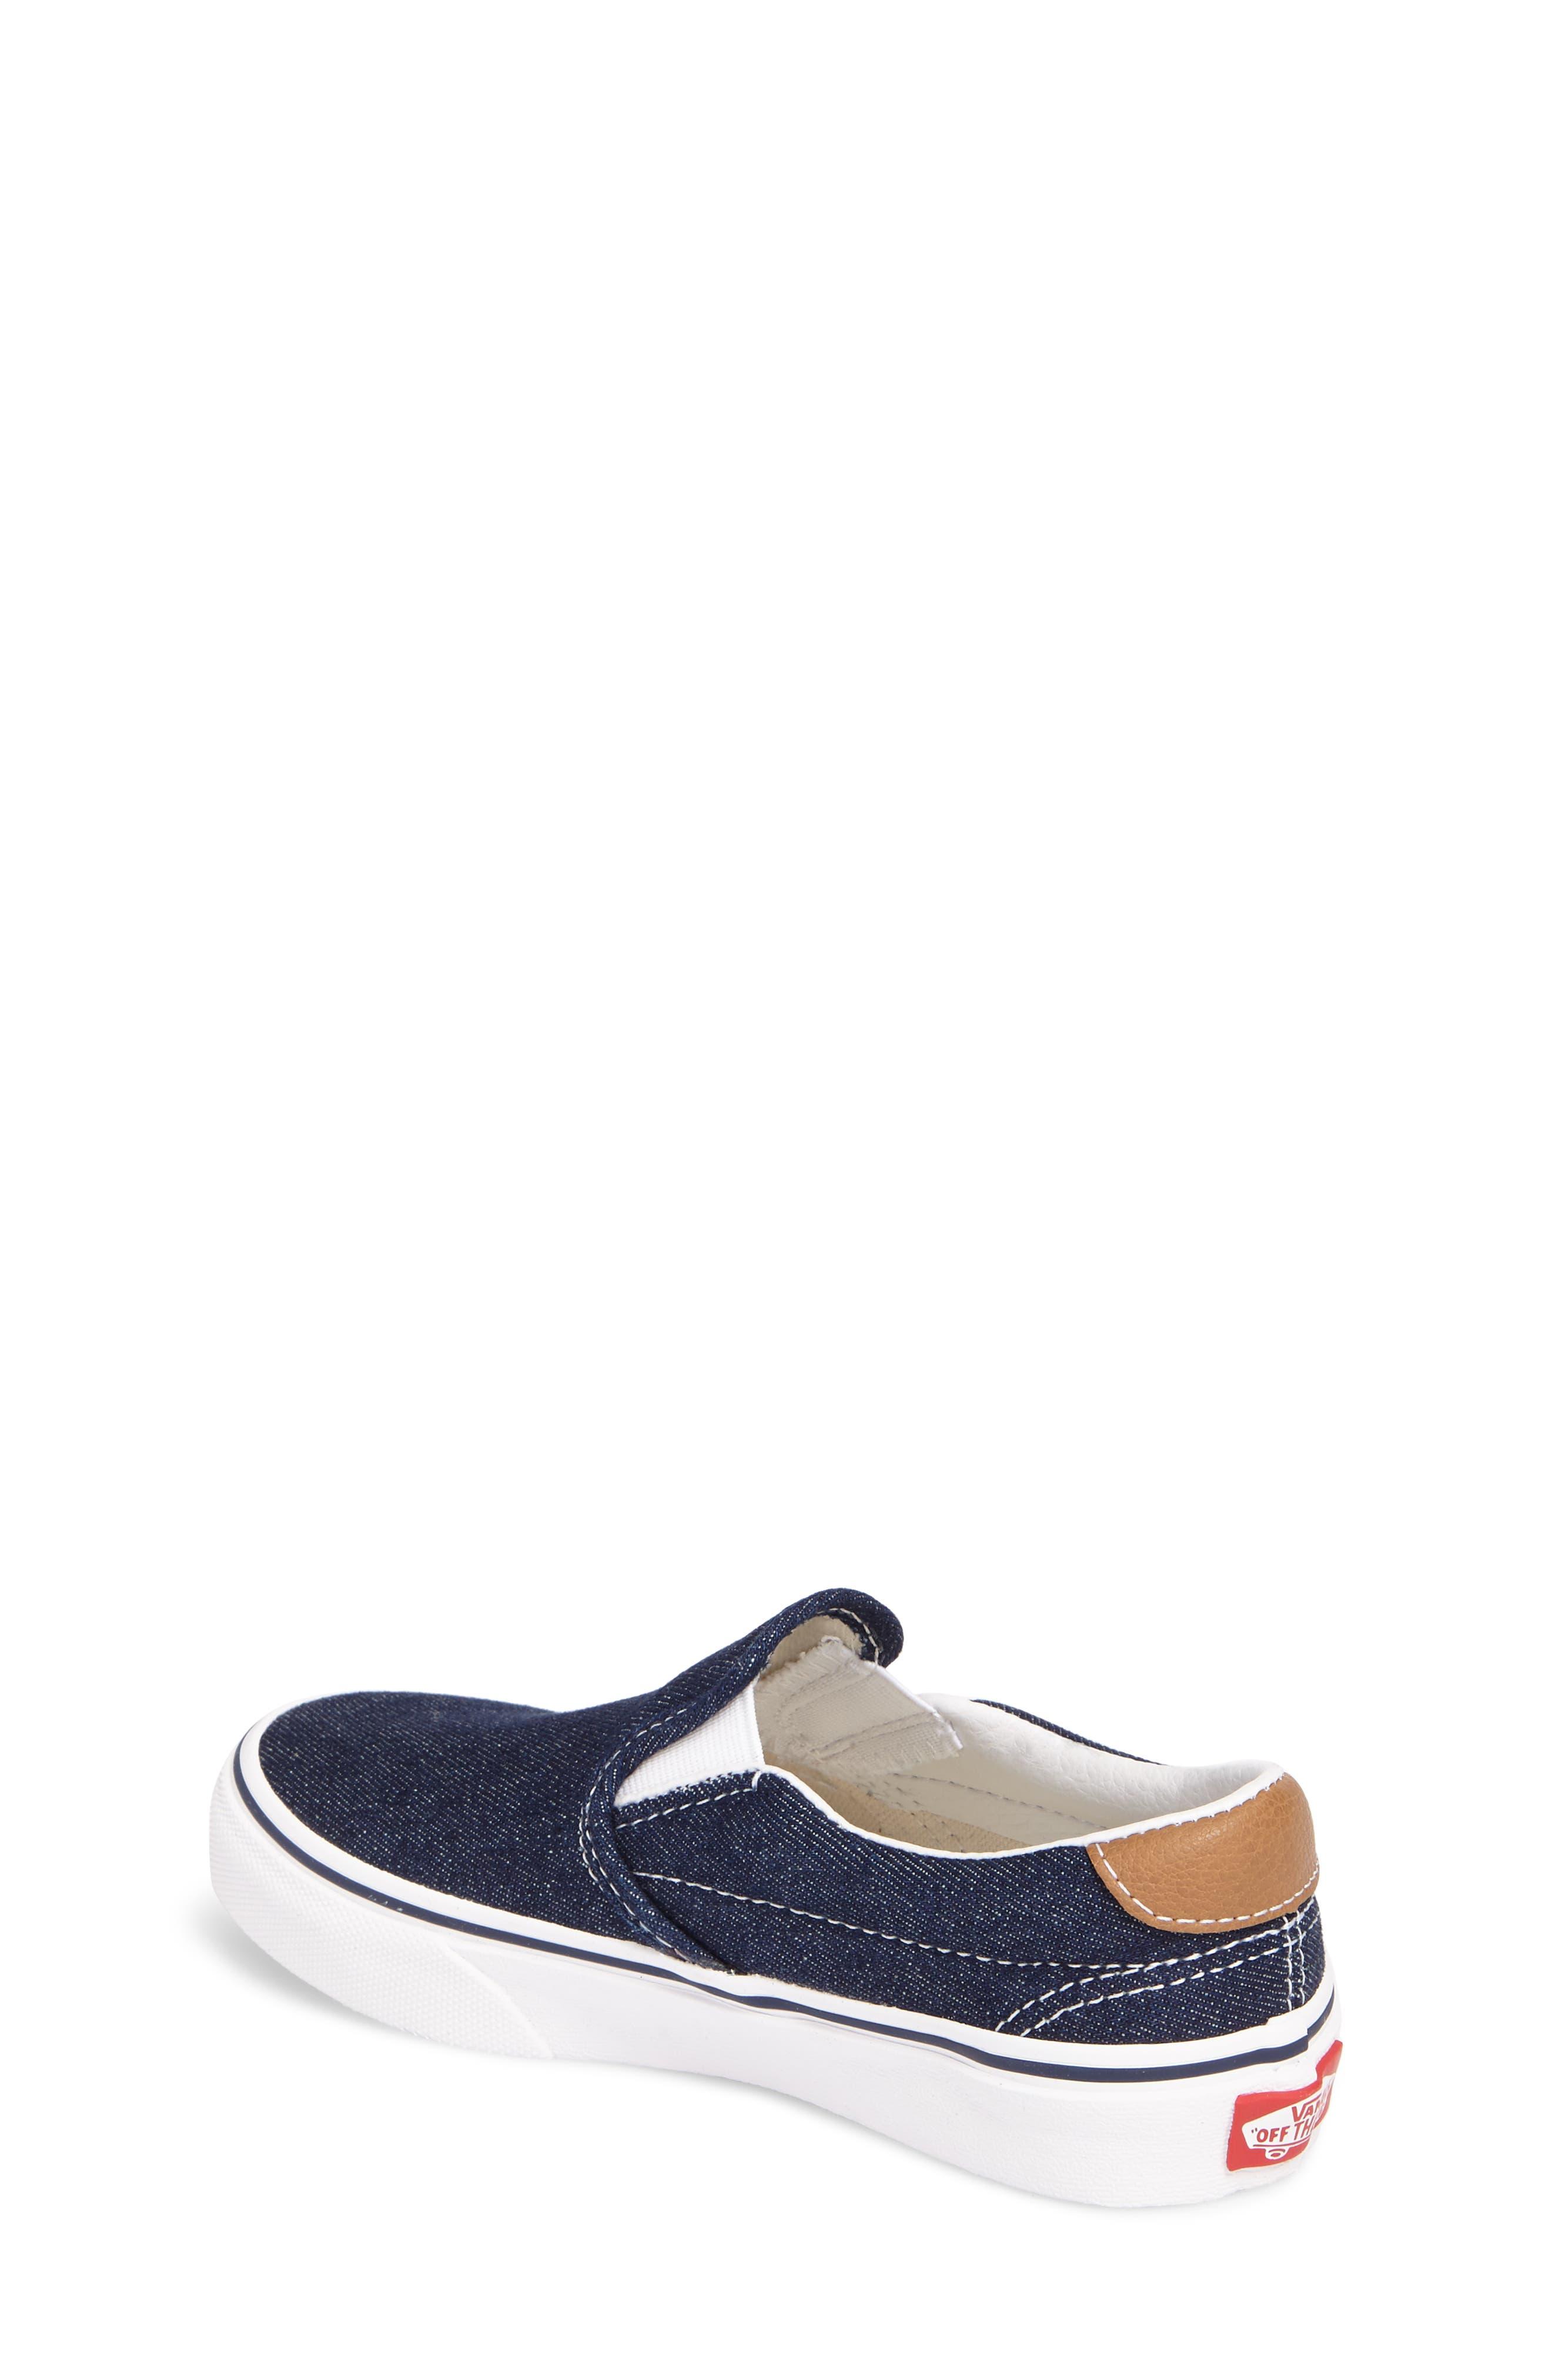 Denim C&L Slip-On 59 Sneaker,                             Alternate thumbnail 2, color,                             Denim Dress Blues/ Chipmunk